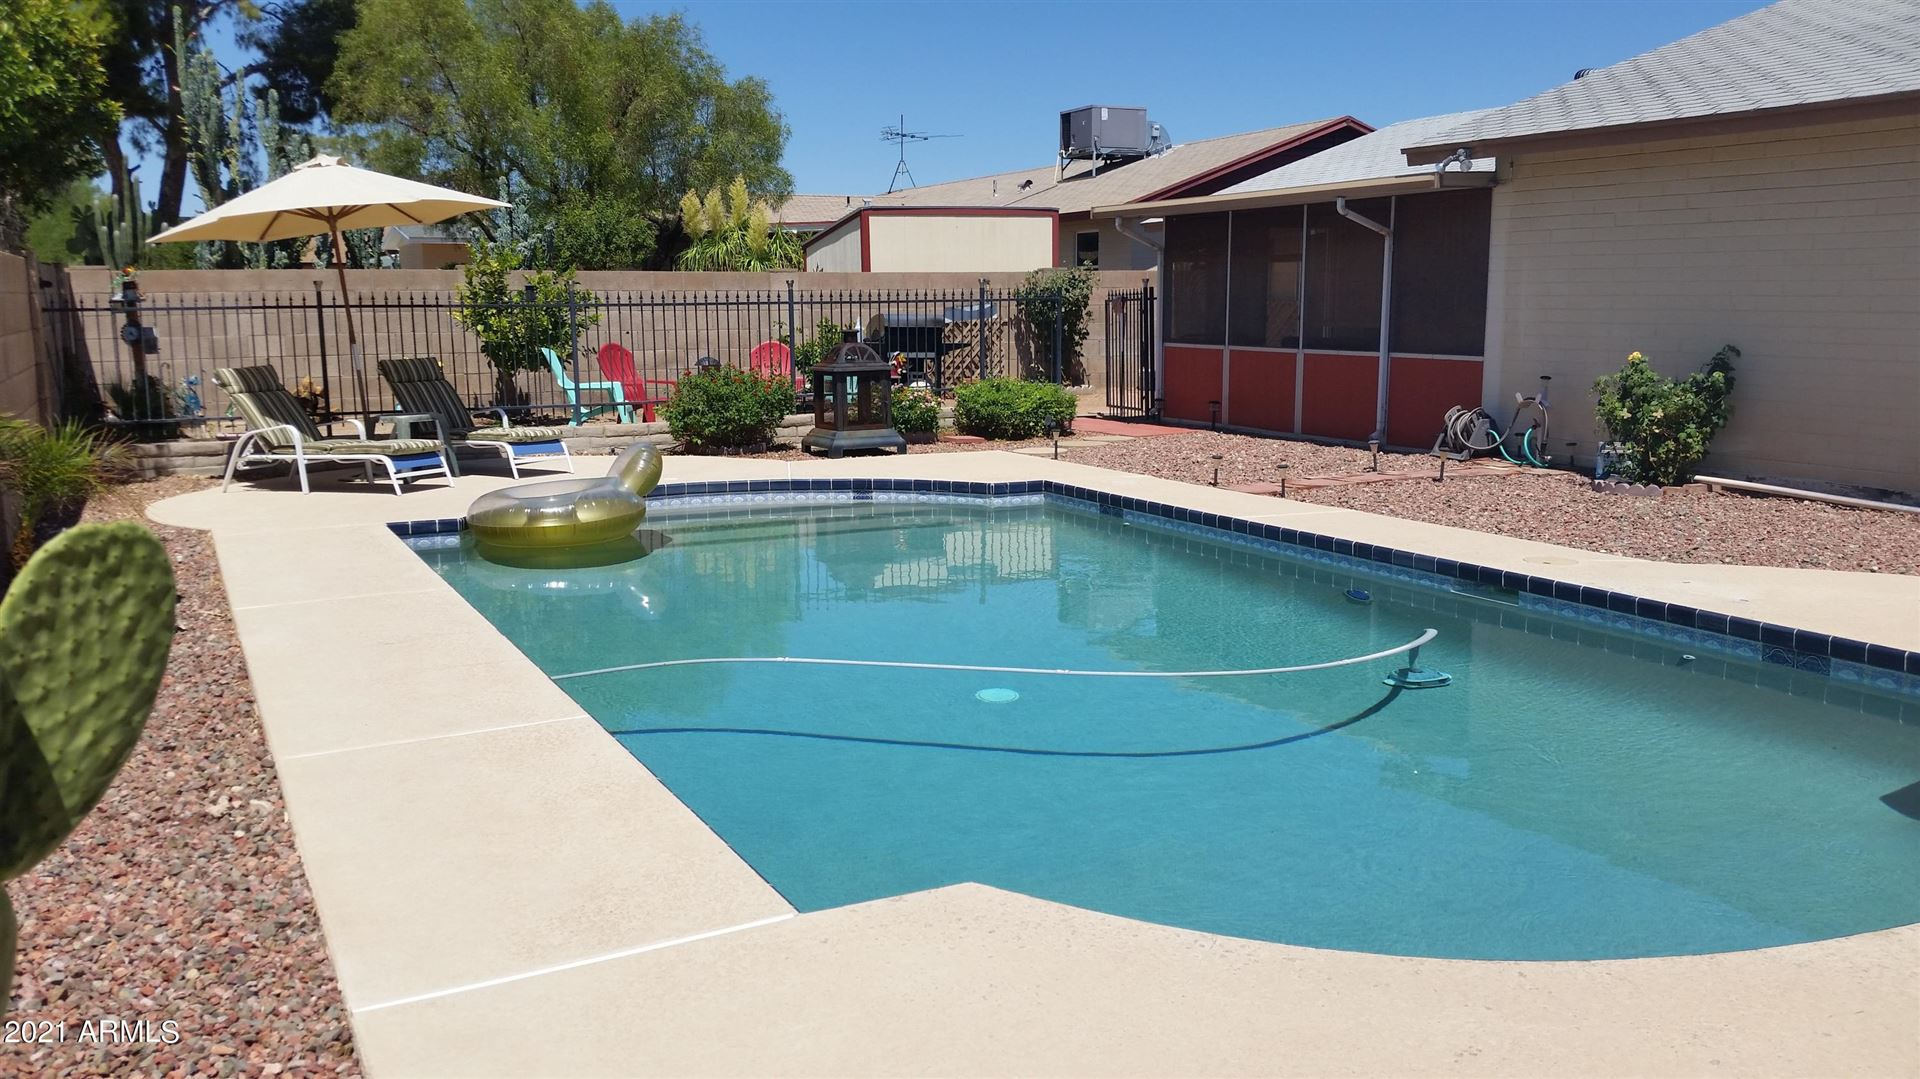 Photo of 10447 W ORCHID Lane, Peoria, AZ 85345 (MLS # 6249569)